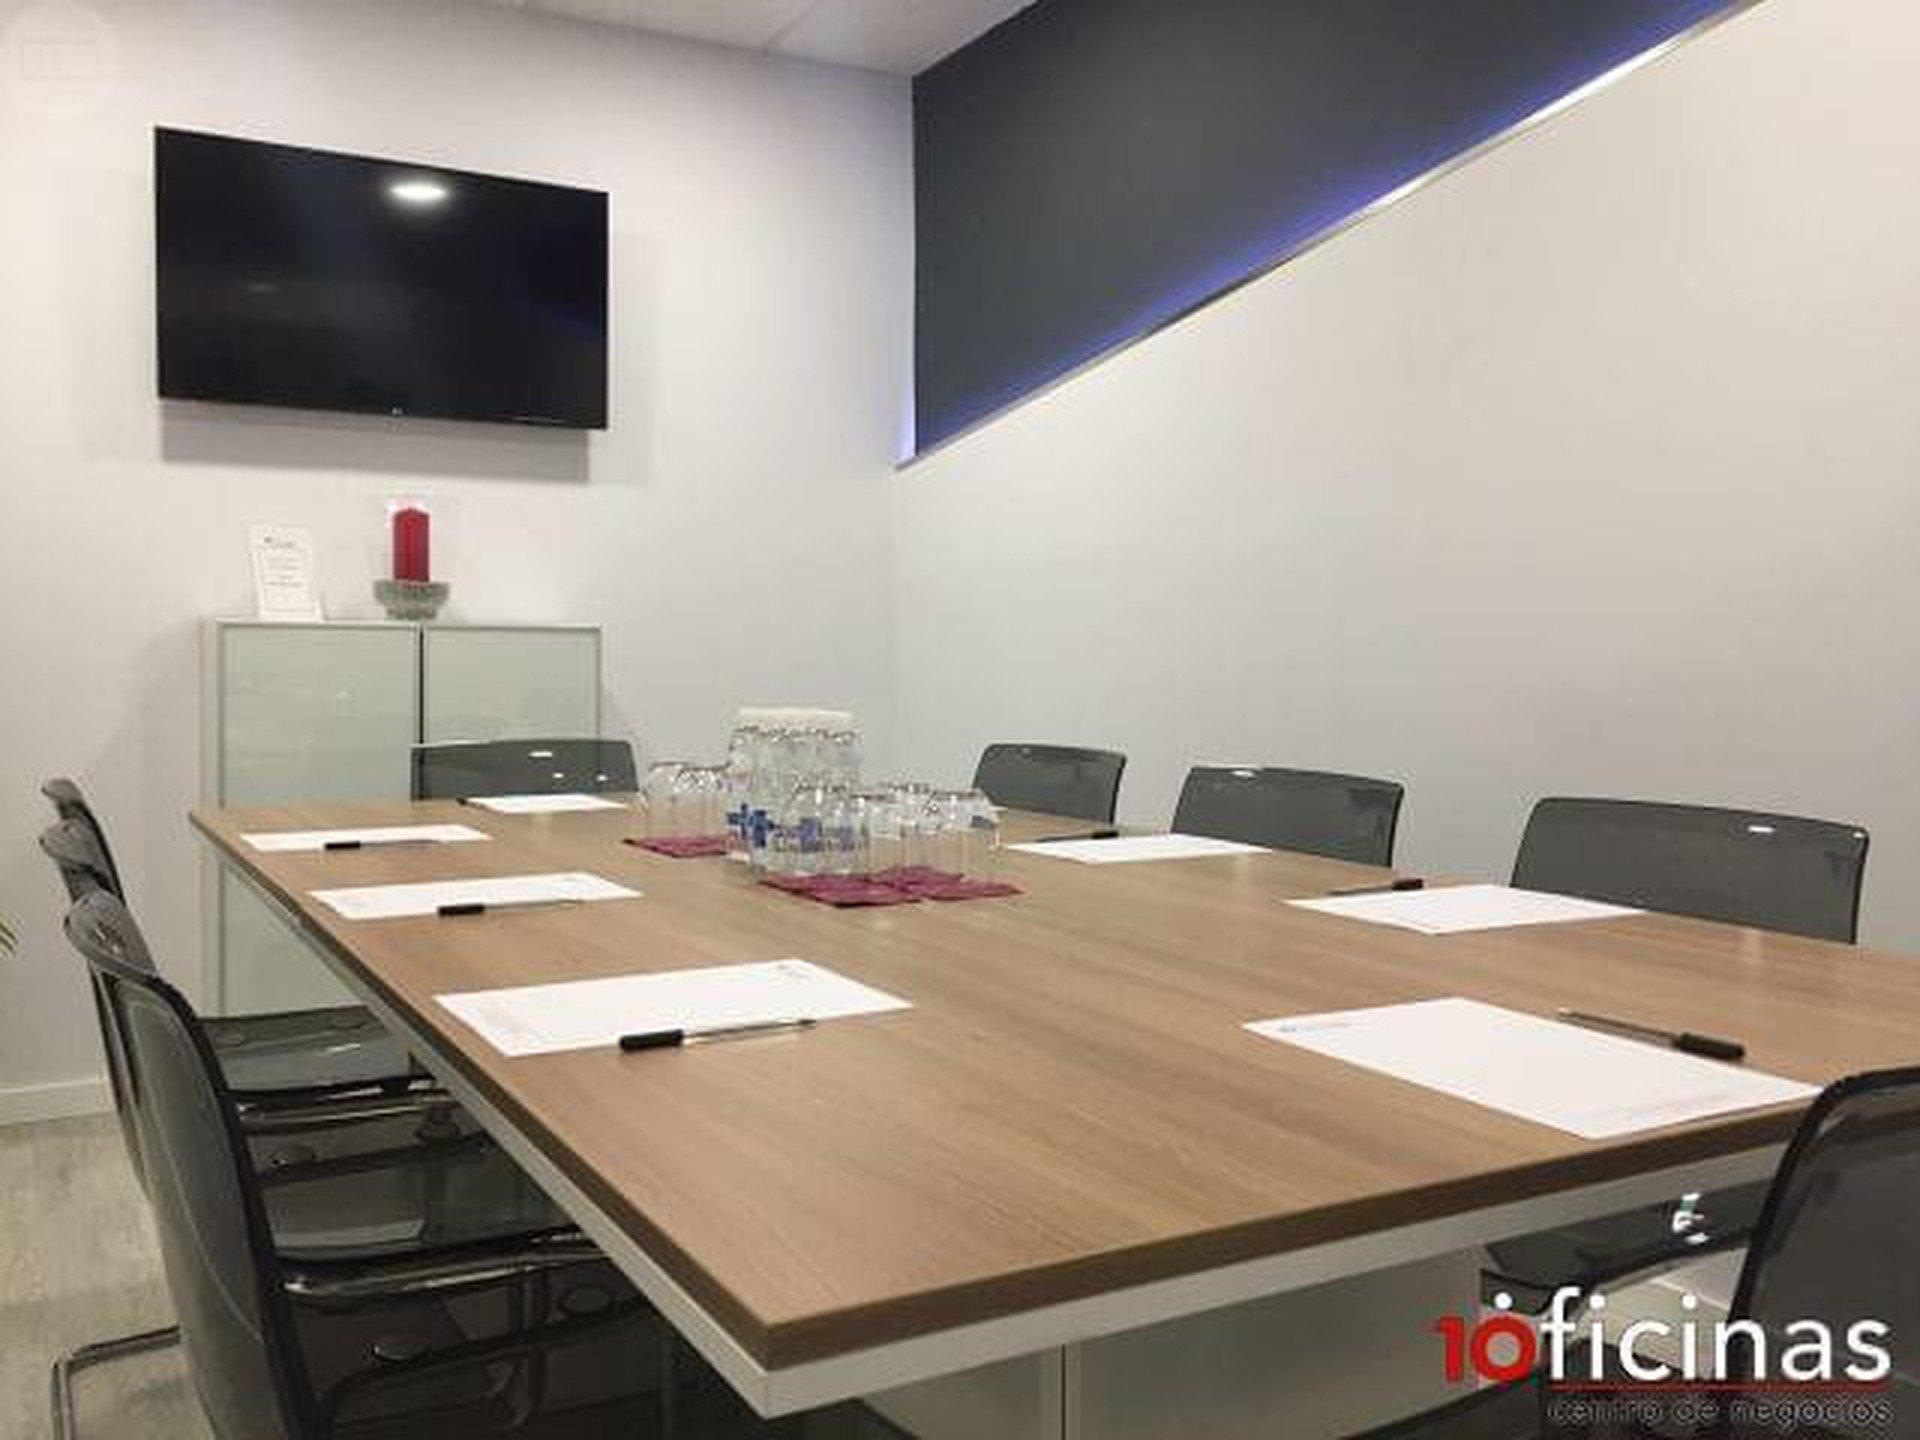 Malaga conference rooms Salle de réunion Oficinas 10 - Meeting Room 1 image 0